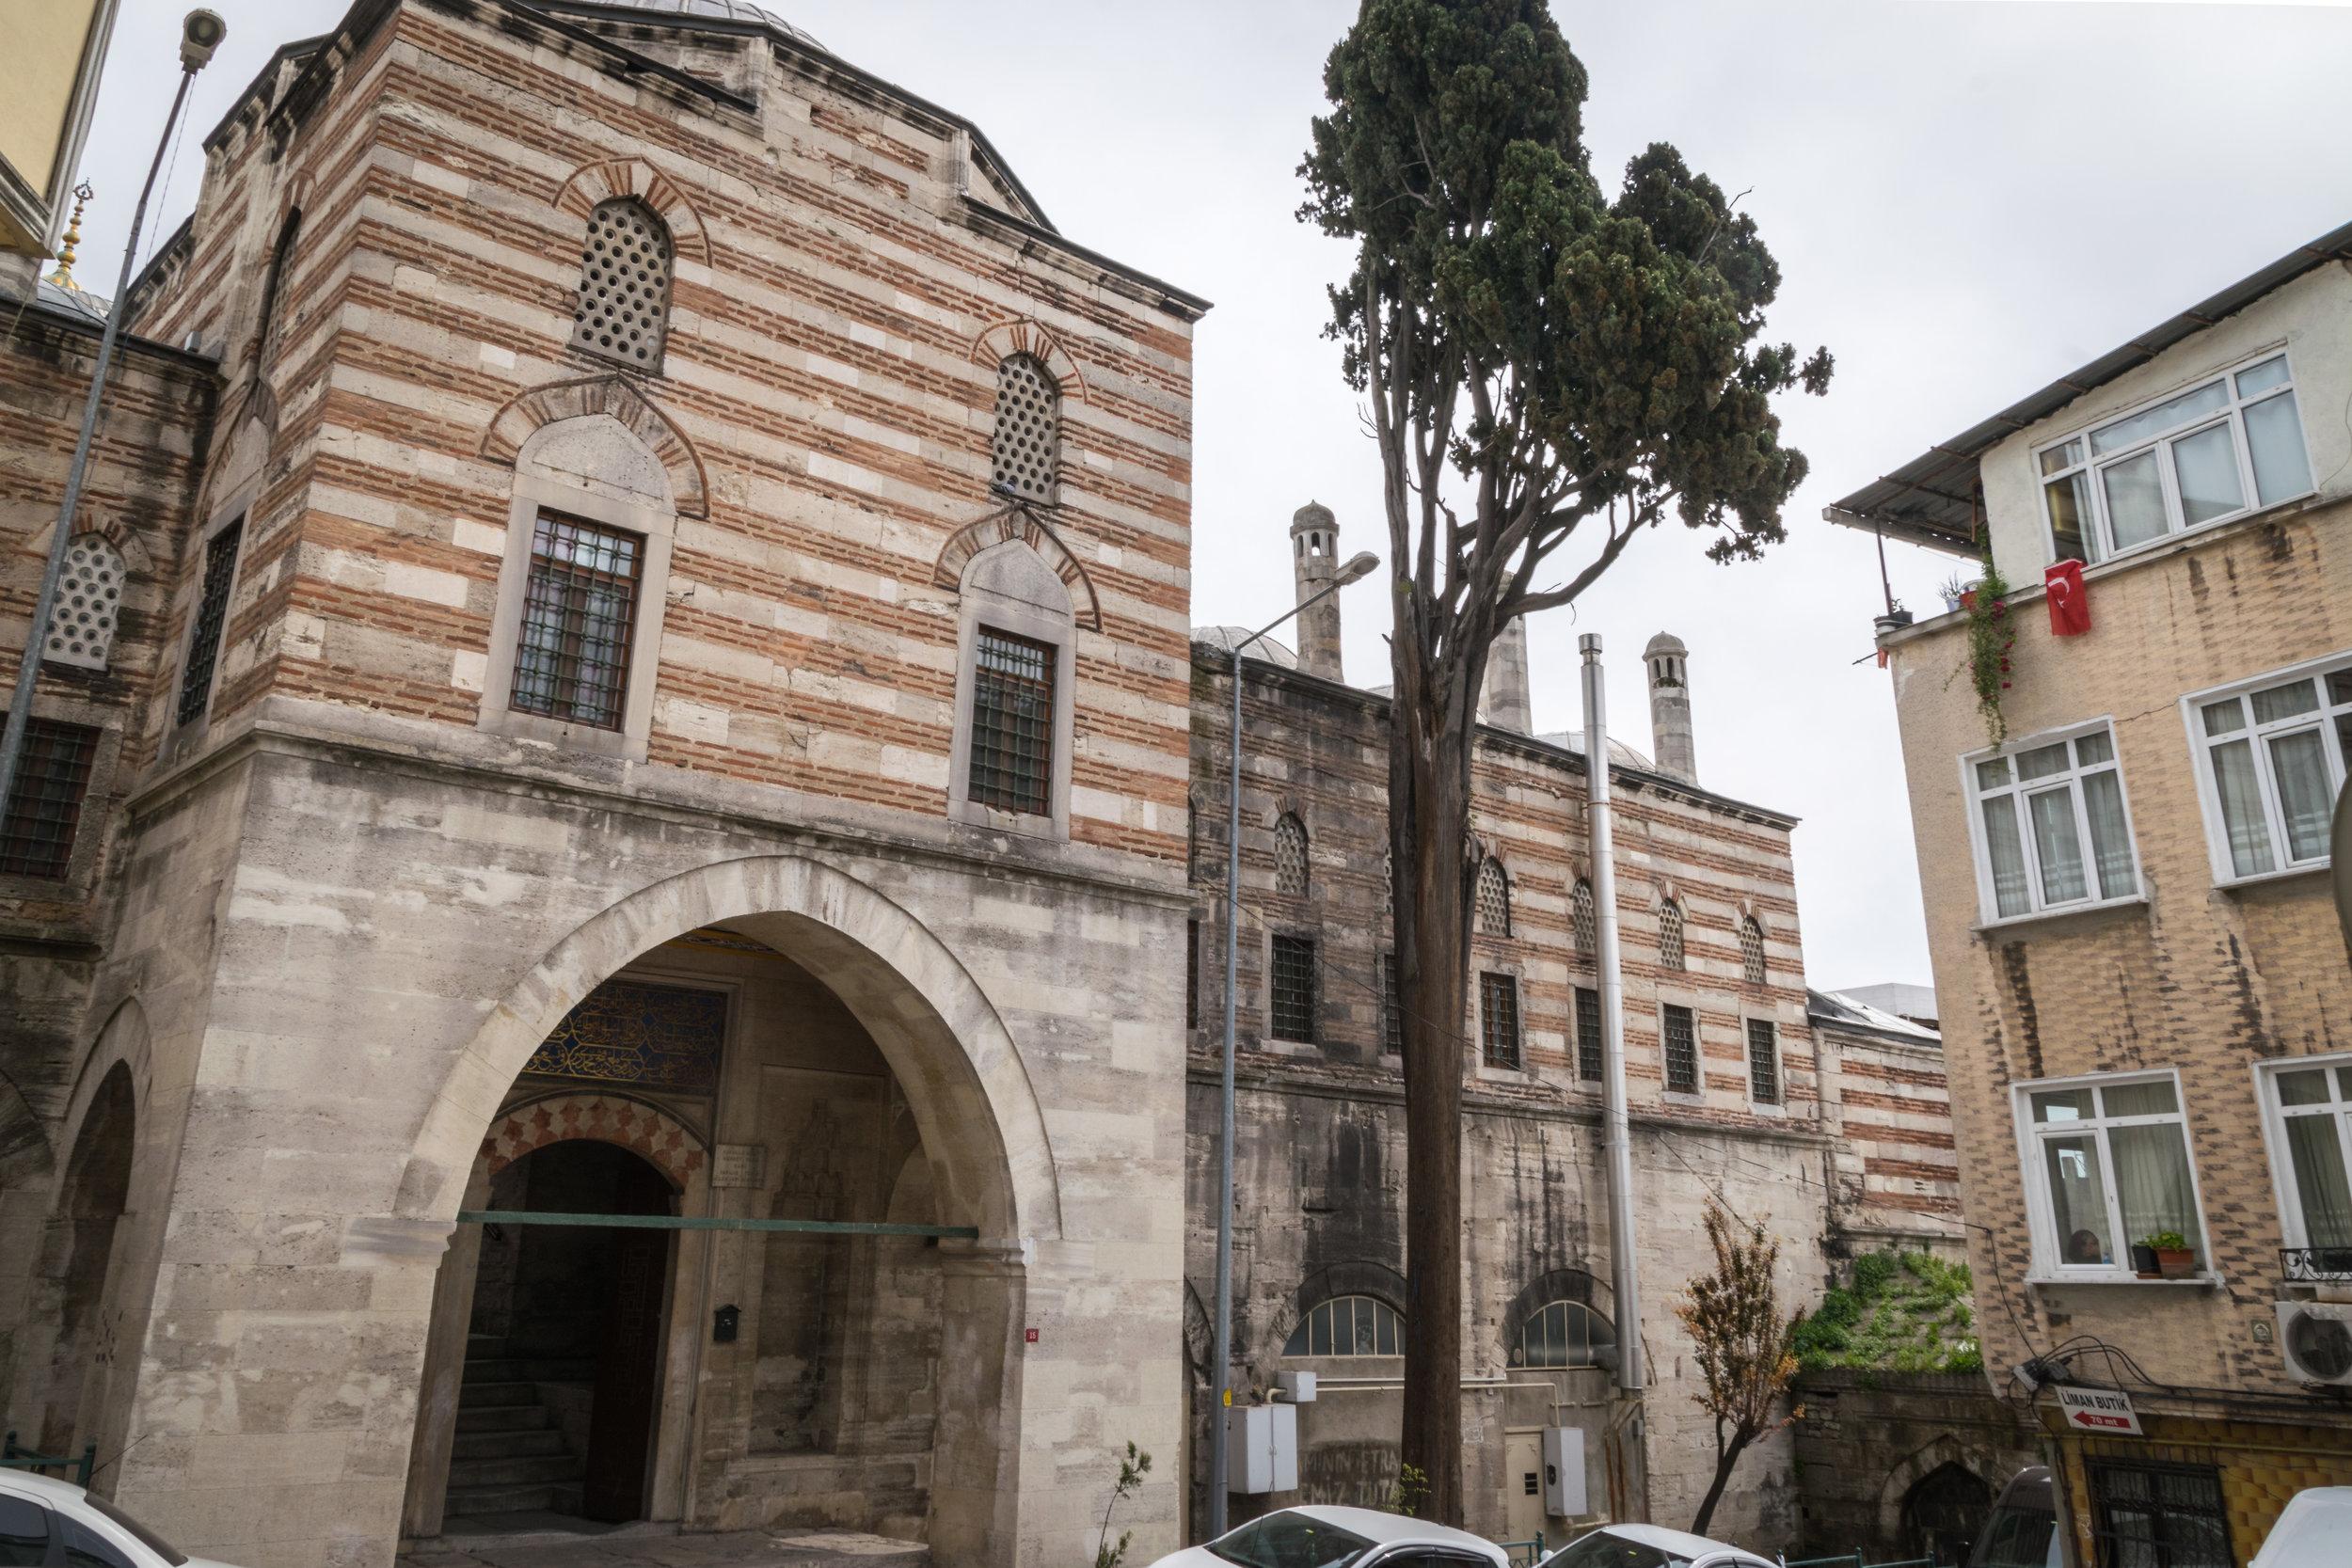 Istanbul UNESCO_Sokollu Mehmet Pasha Mosque-2.jpg